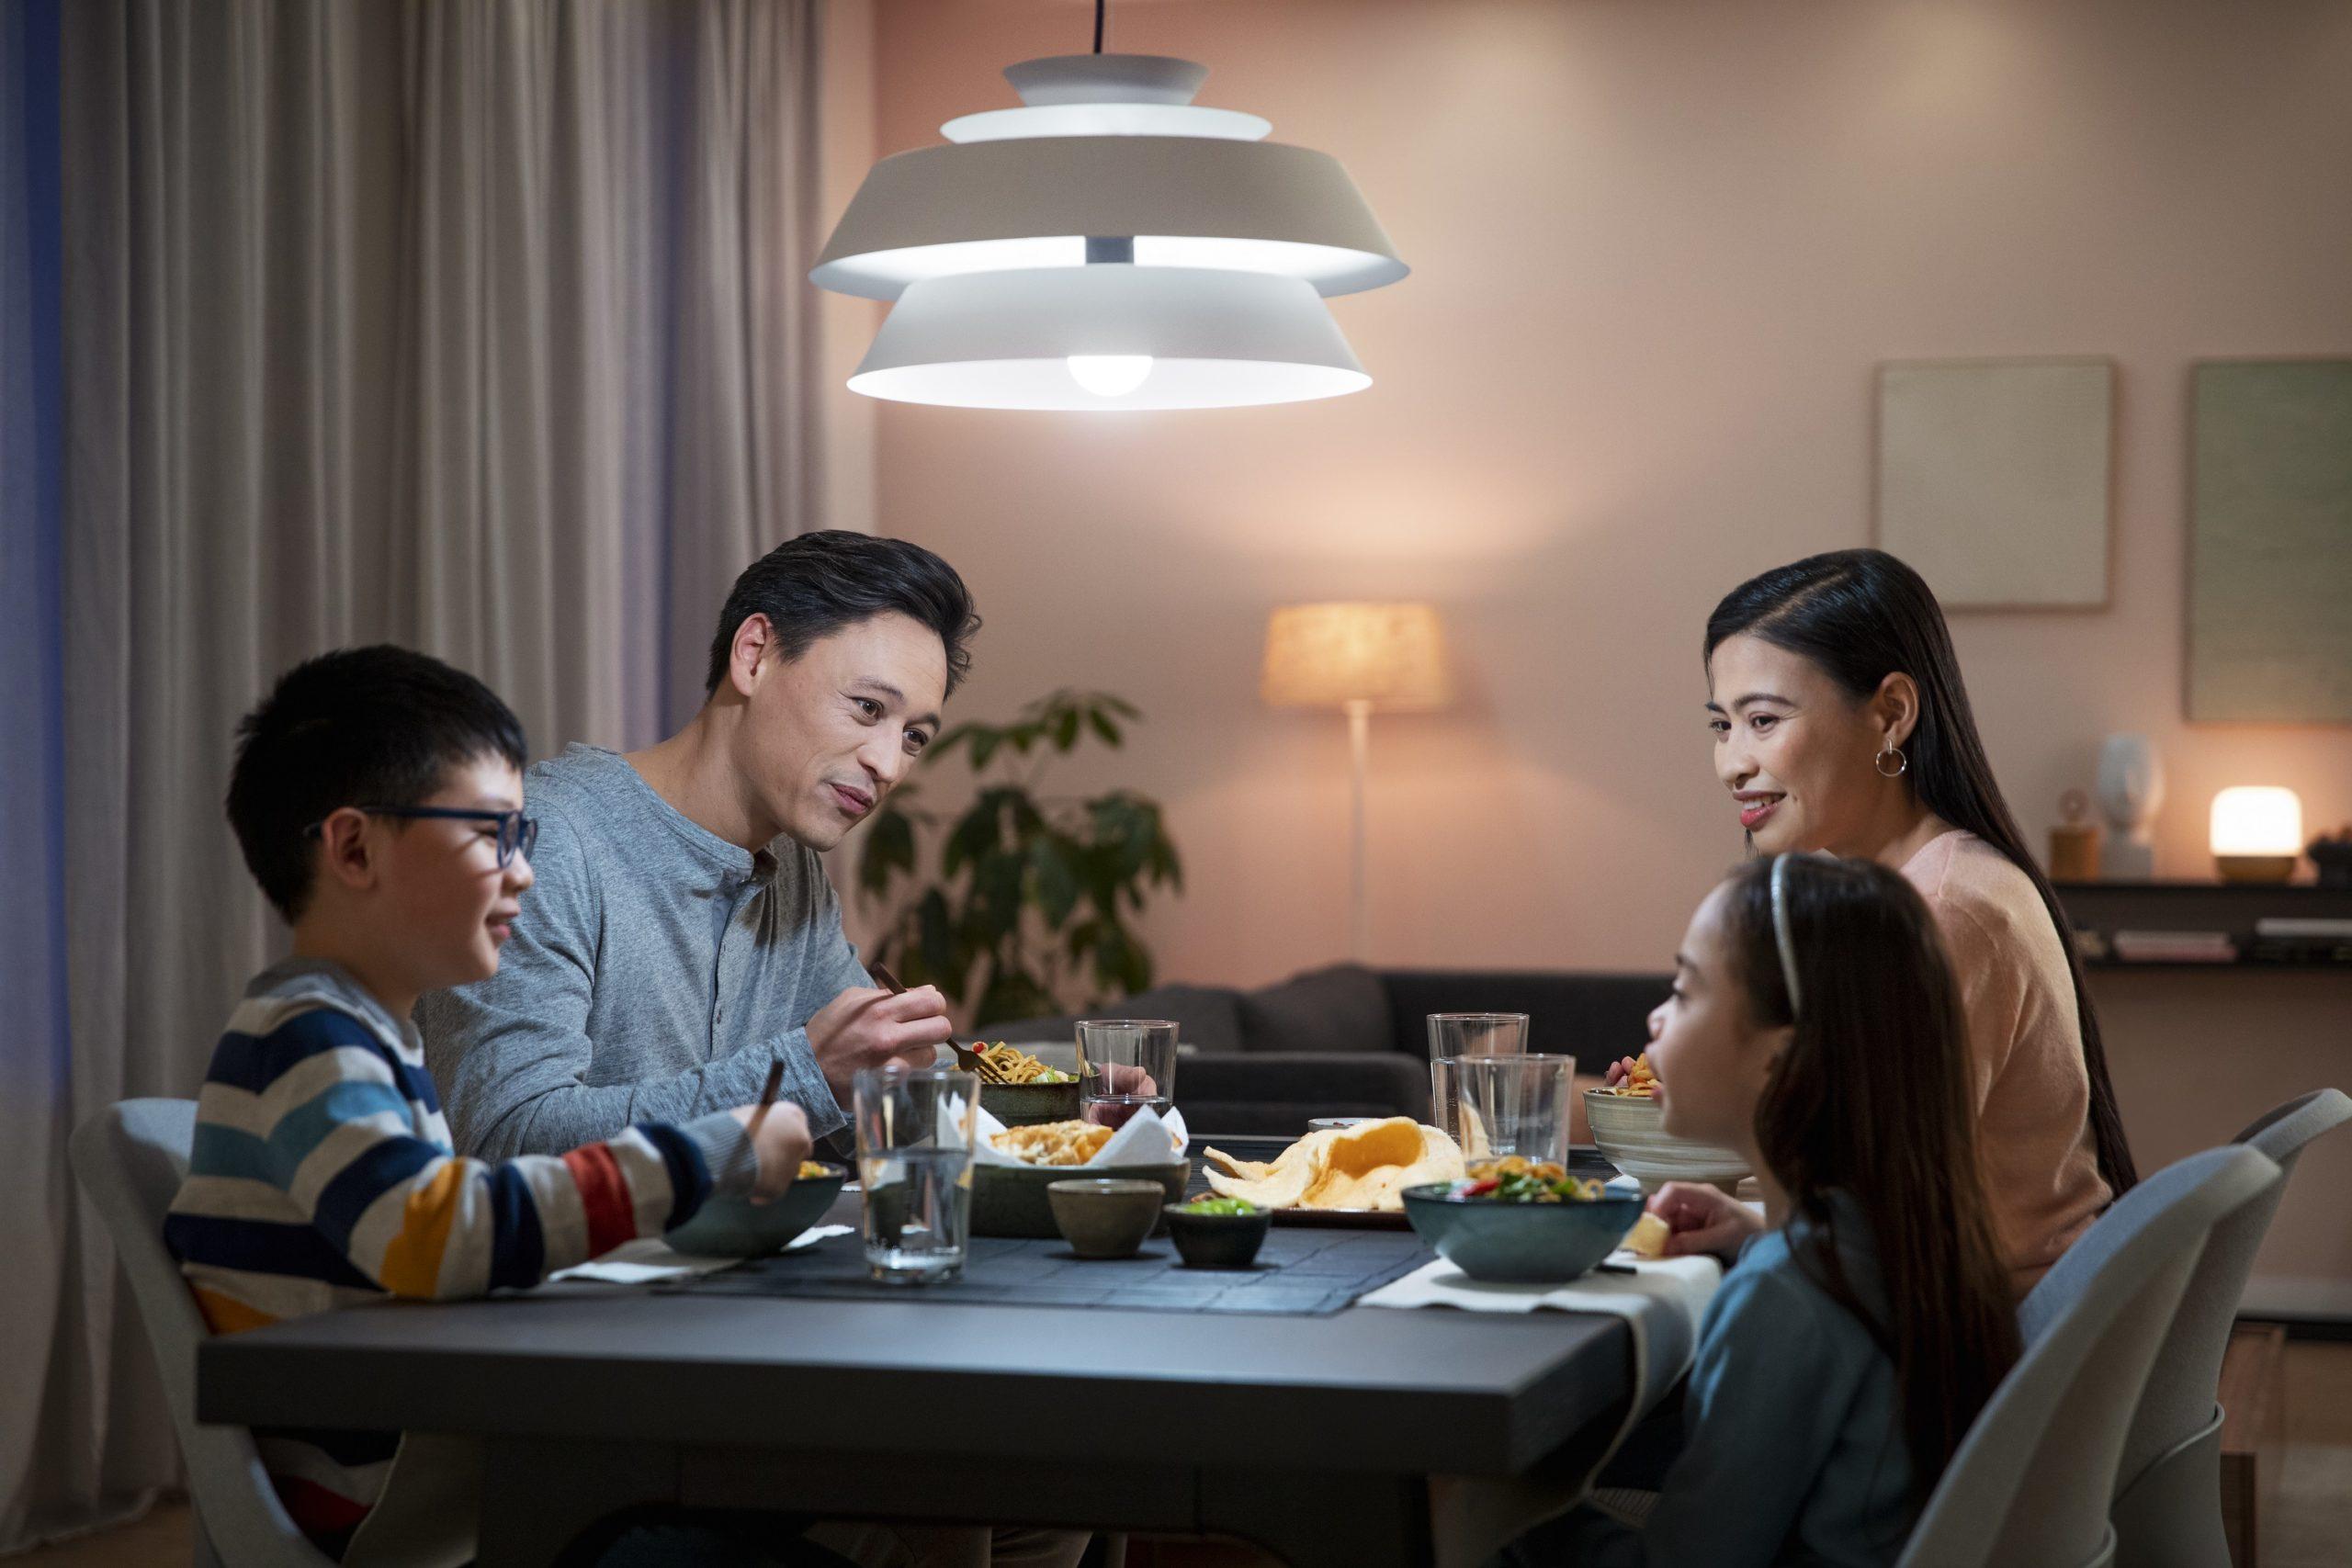 Philips WiFi LED